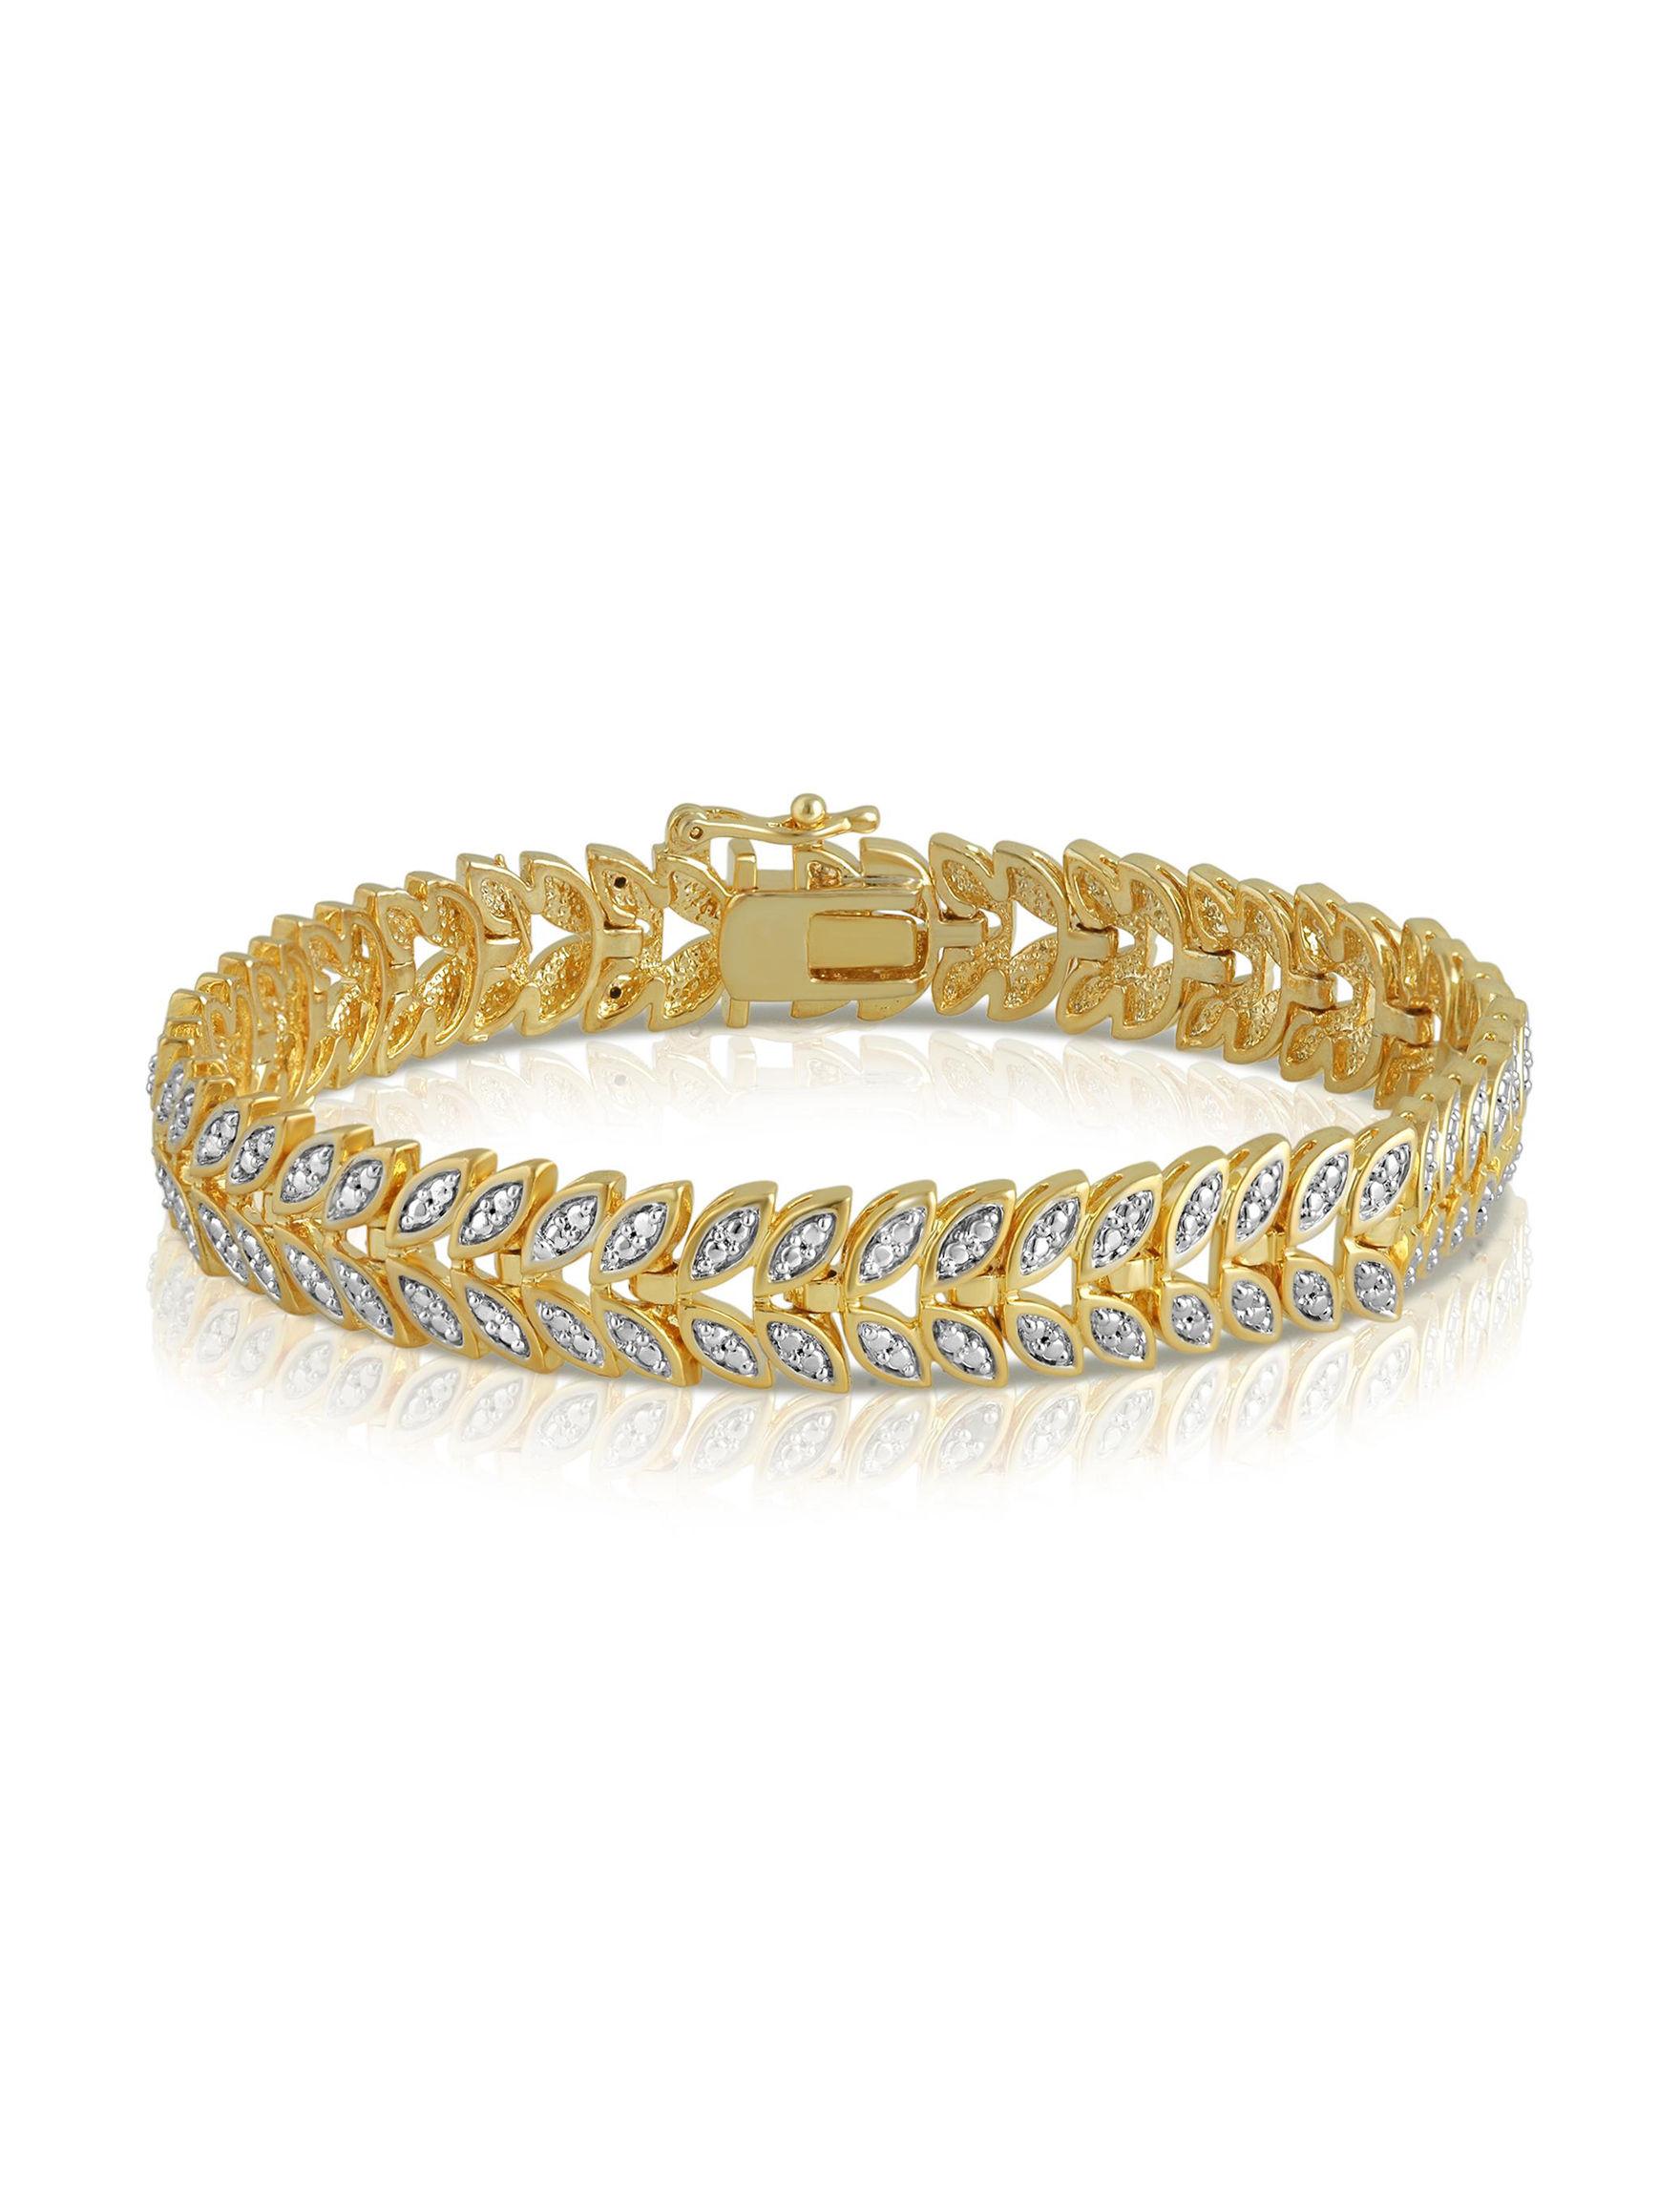 Brilliant Diamond Gold Bracelets Fine Jewelry